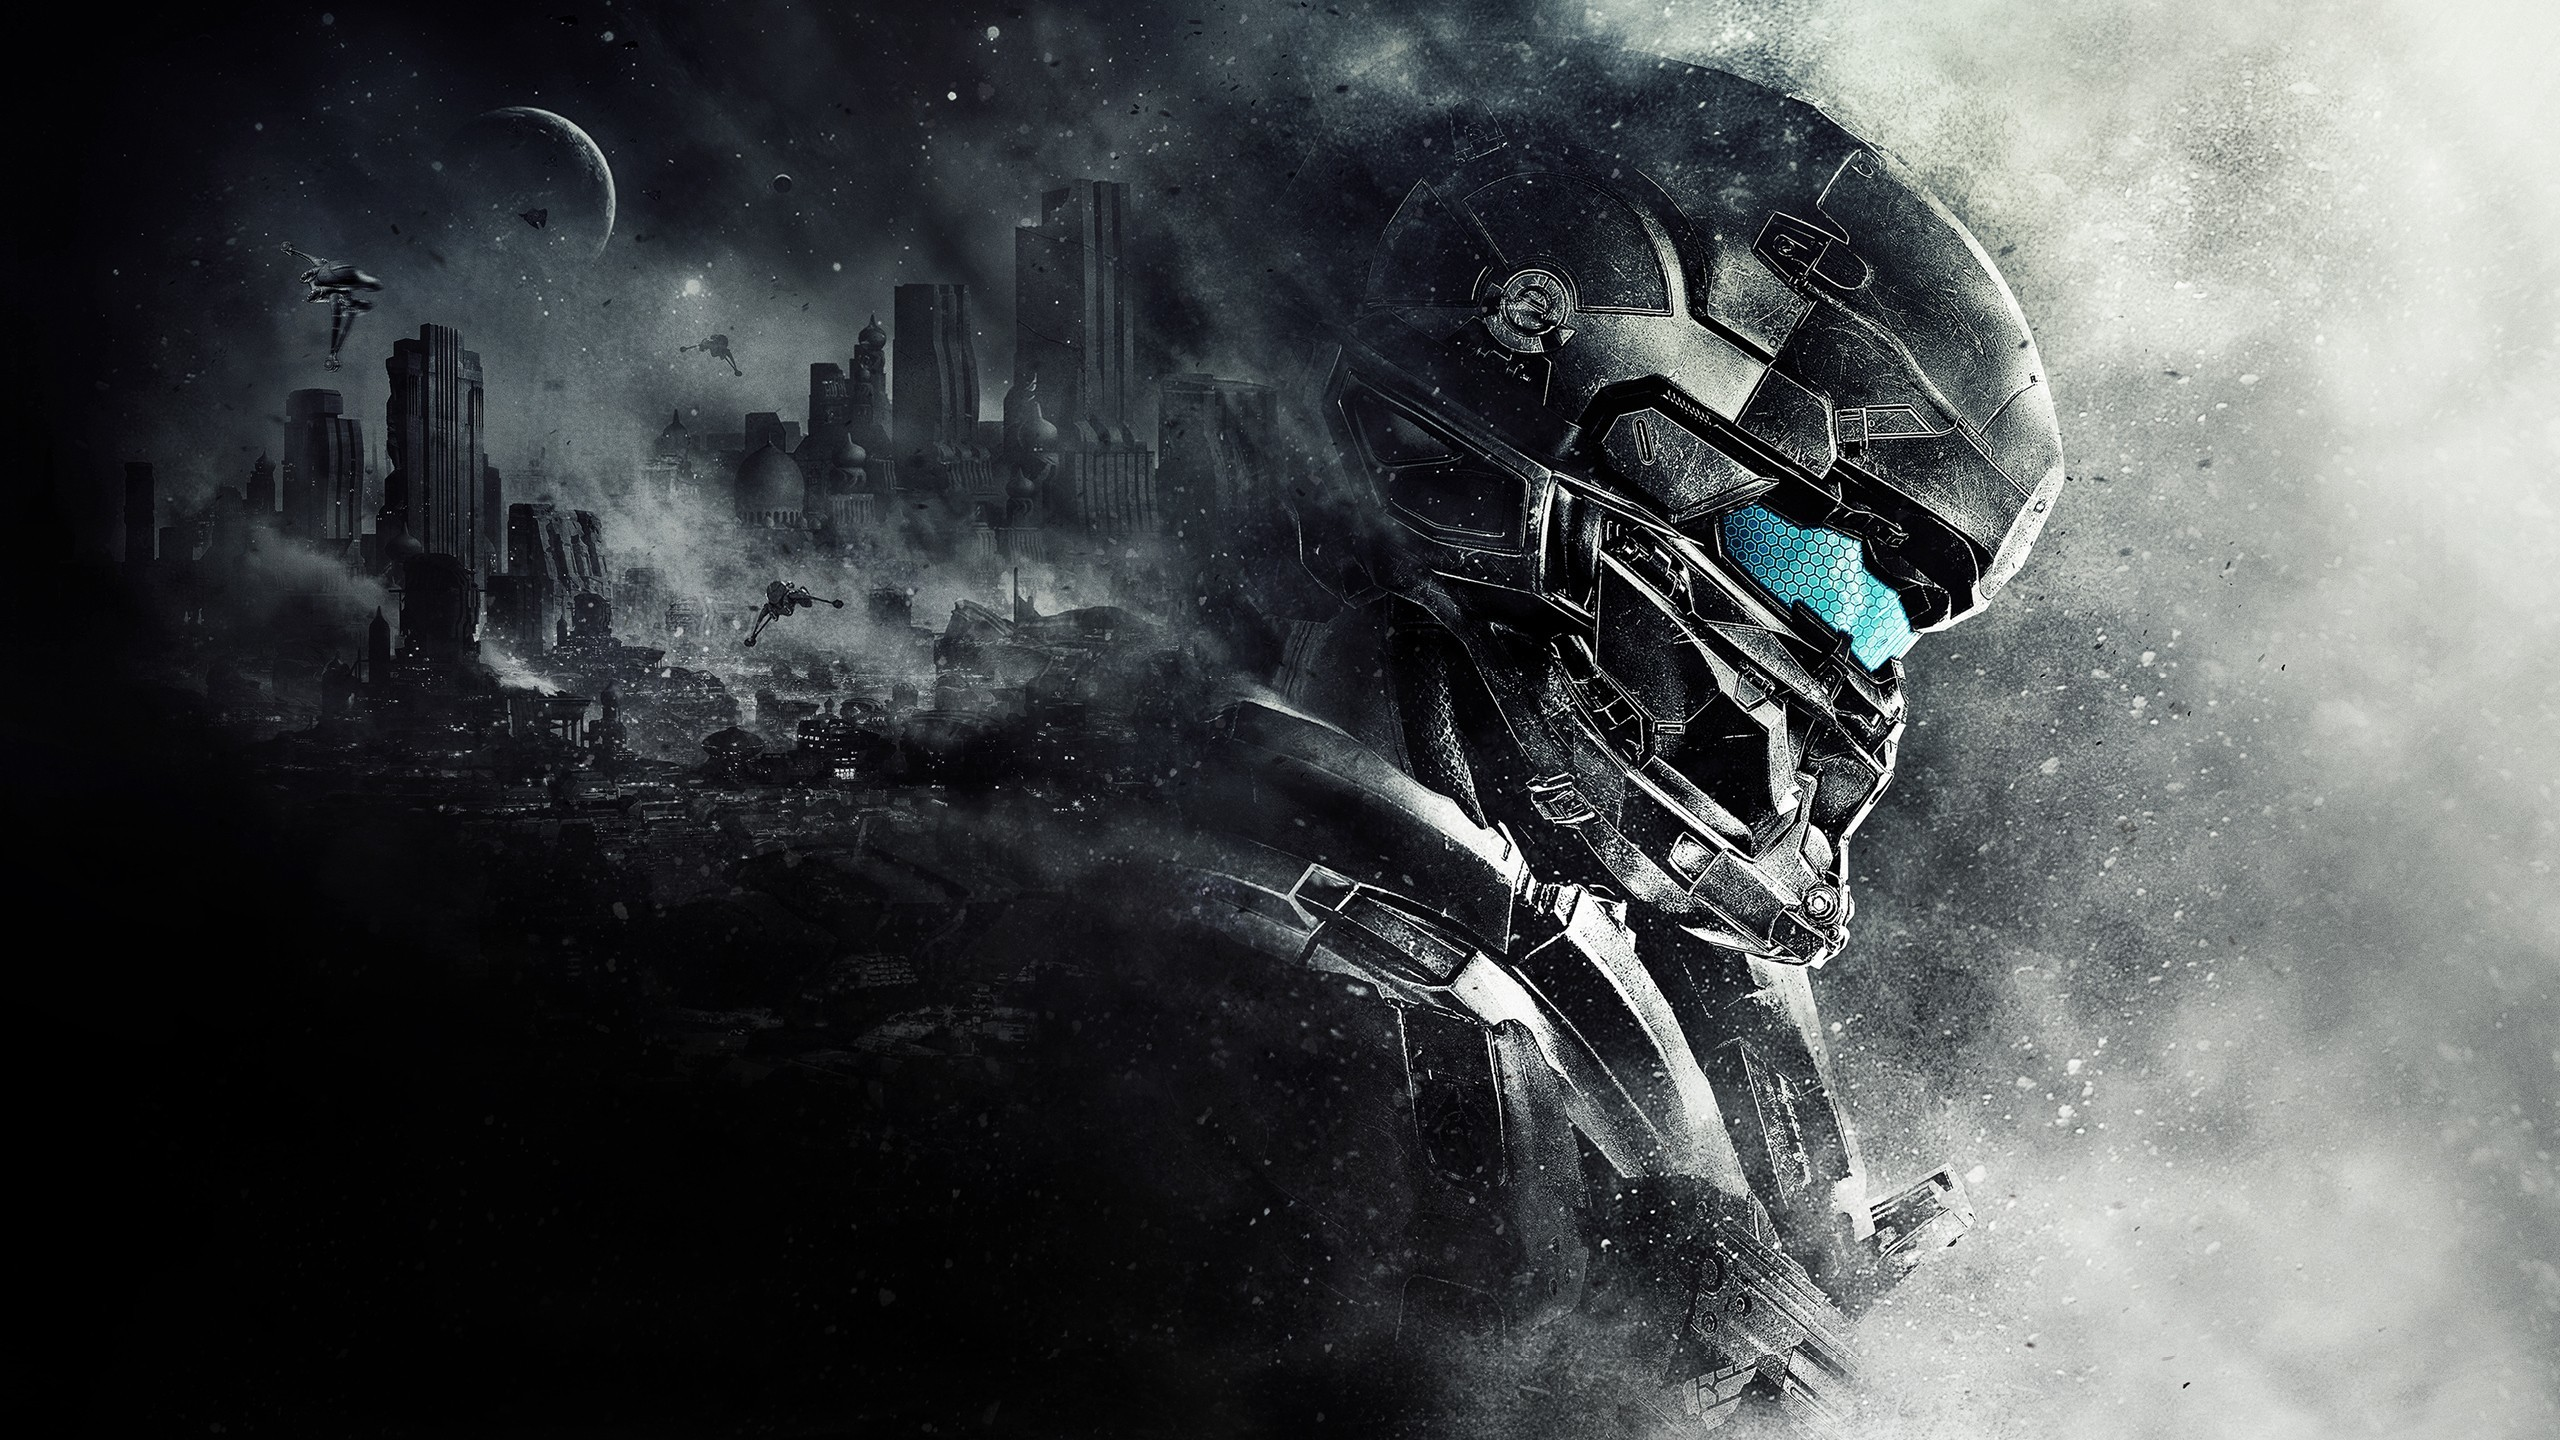 Spartan Locke Halo 5 2048×1152 Resolution